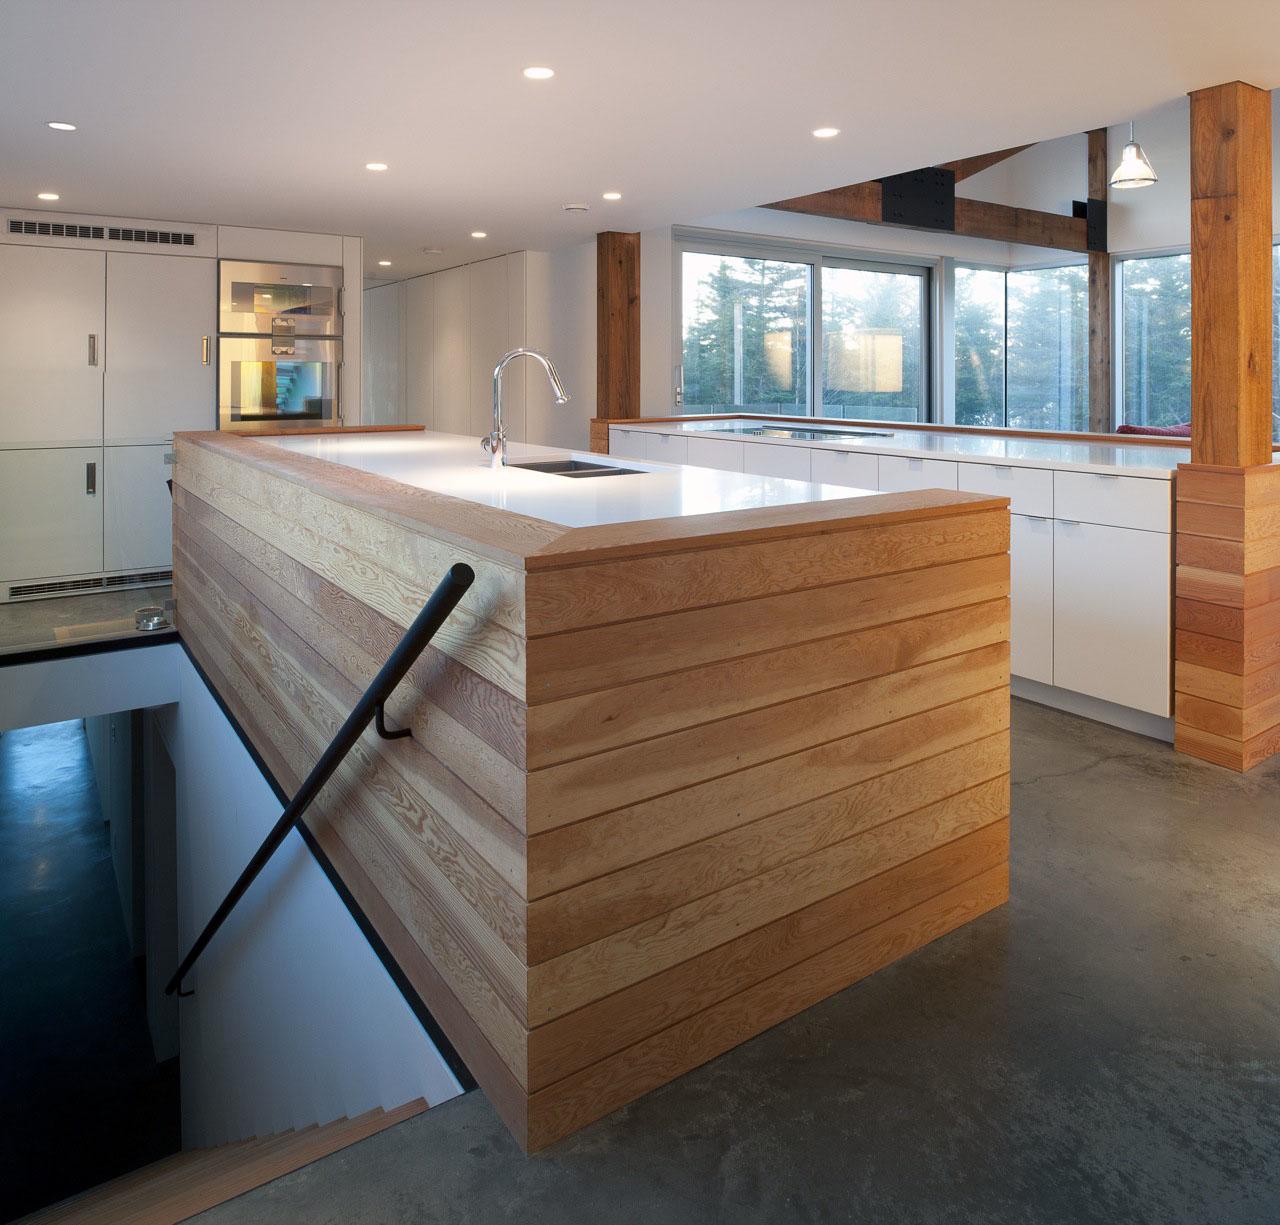 Martin Lancaster House / MacKay-Lyons Sweetapple (3)